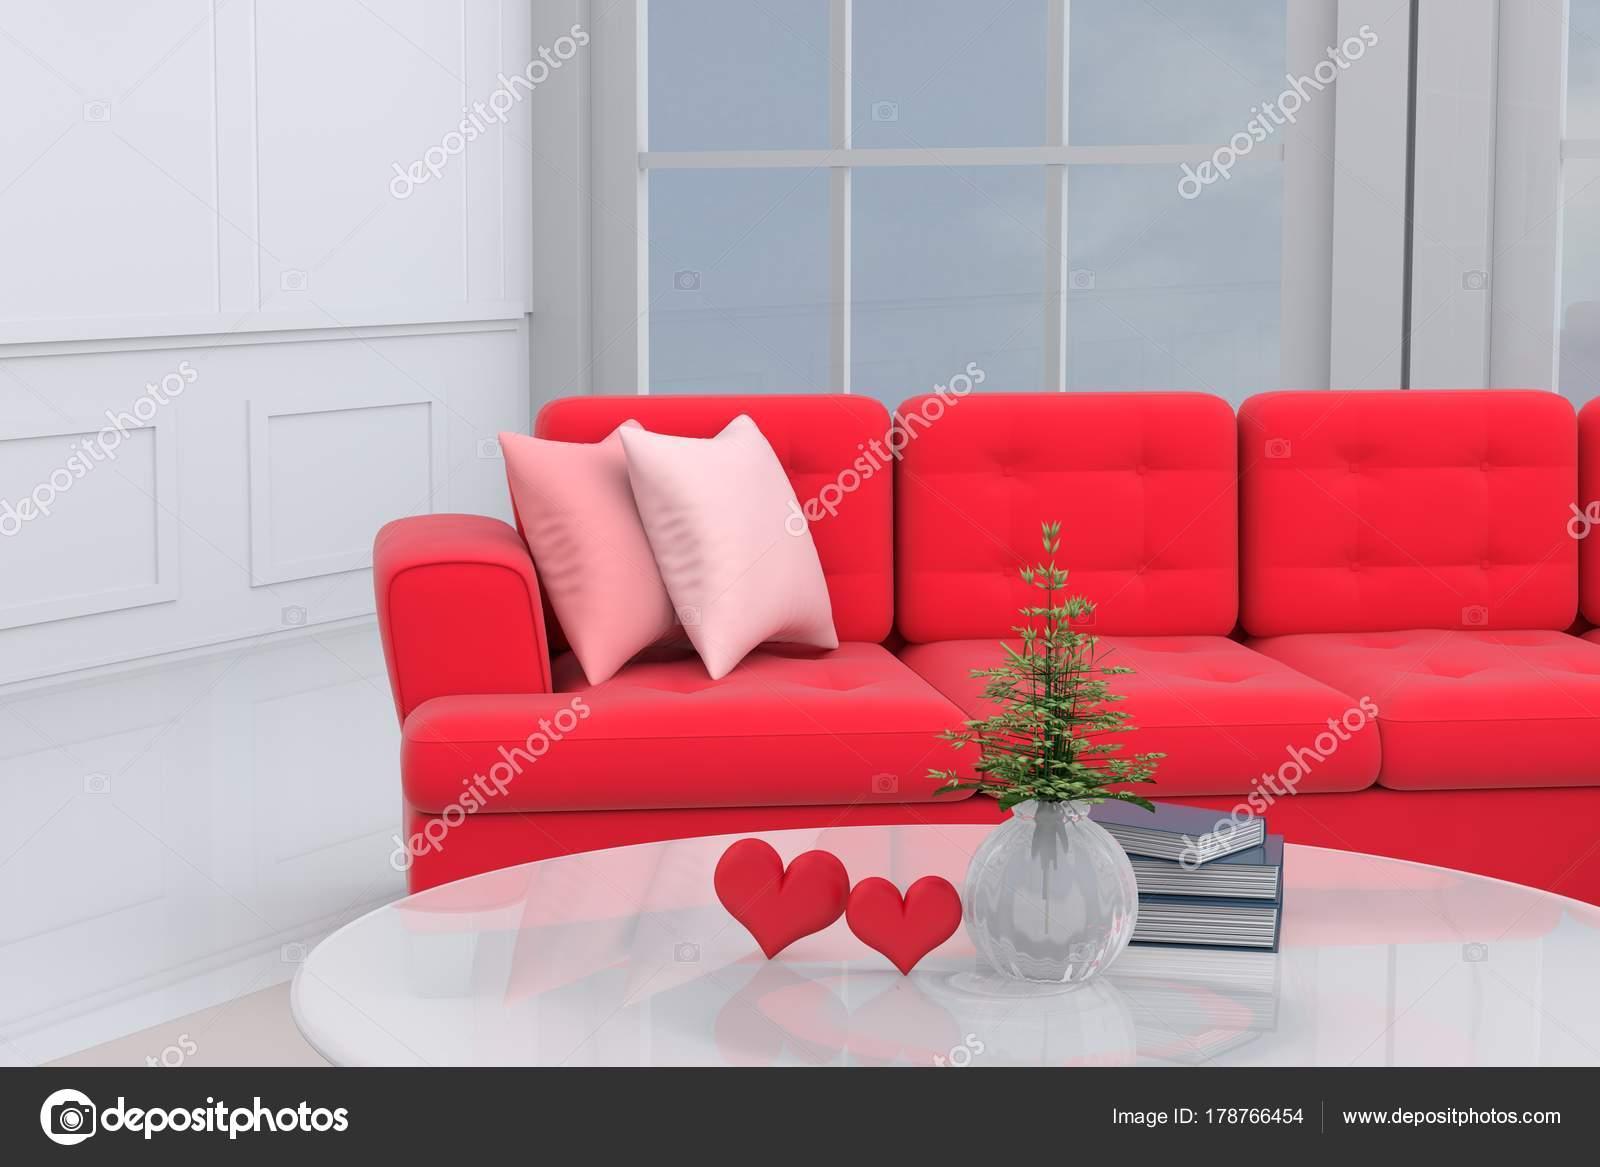 https://st3.depositphotos.com/12406876/17876/i/1600/depositphotos_178766454-stockafbeelding-woonkamer-valentine-dag-decor-met.jpg